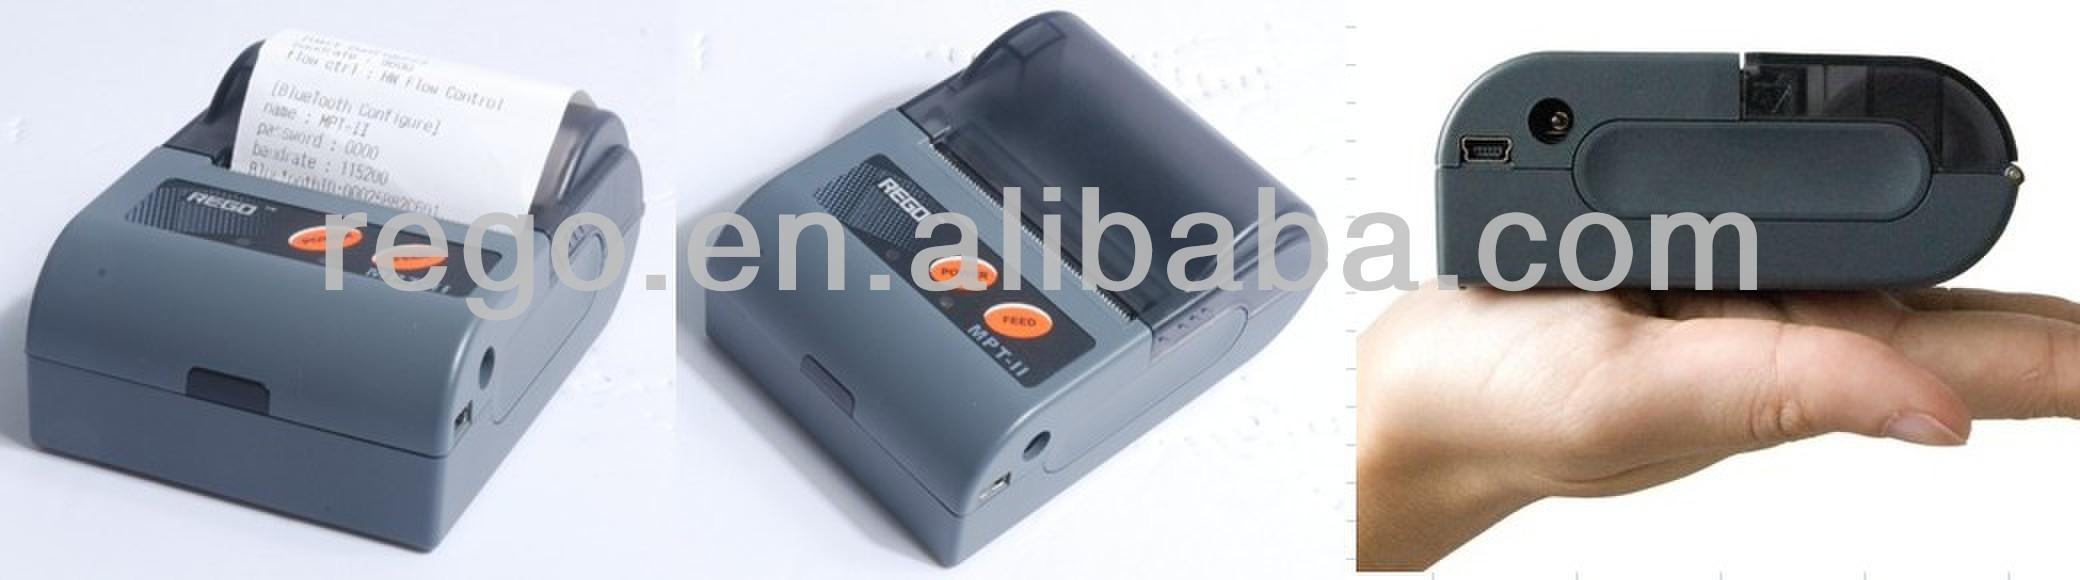 mobile invoice printer mobile invoice printer for mobile sales buy mobile invoice 2080 X 580